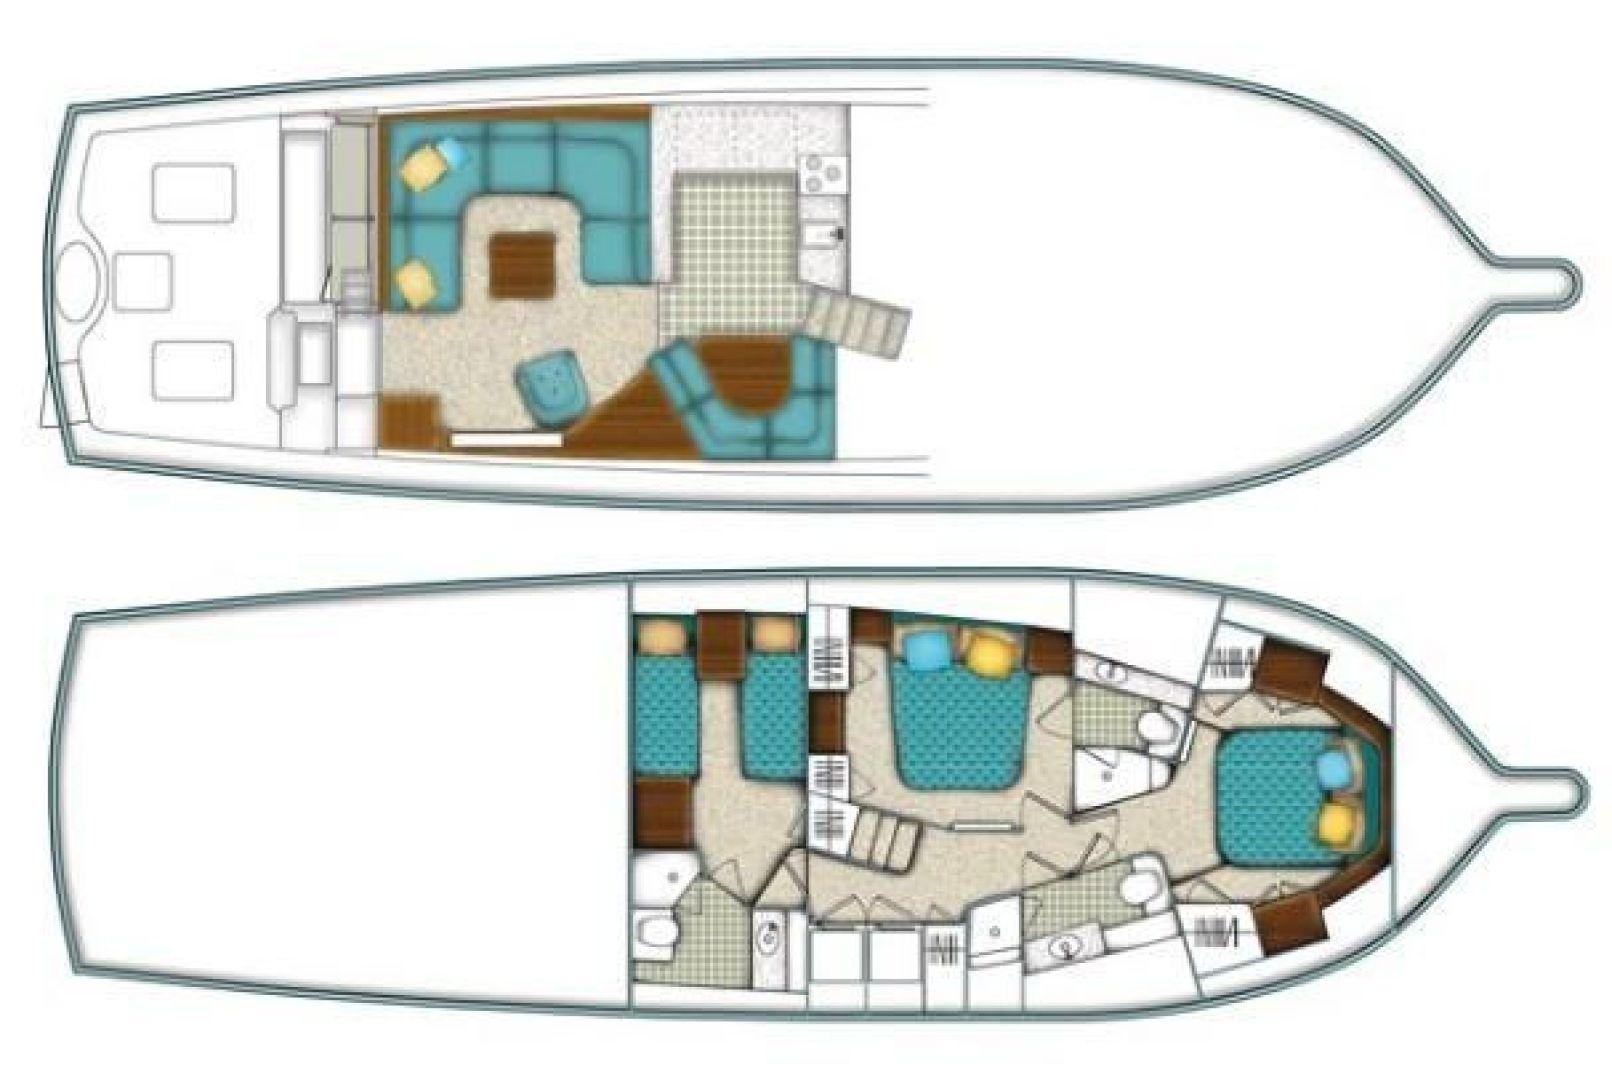 Ocean Yachts-Convertible 2009-Hog Wild Key West-Florida-United States-54 Ocean Yachts Layout-1322133   Thumbnail